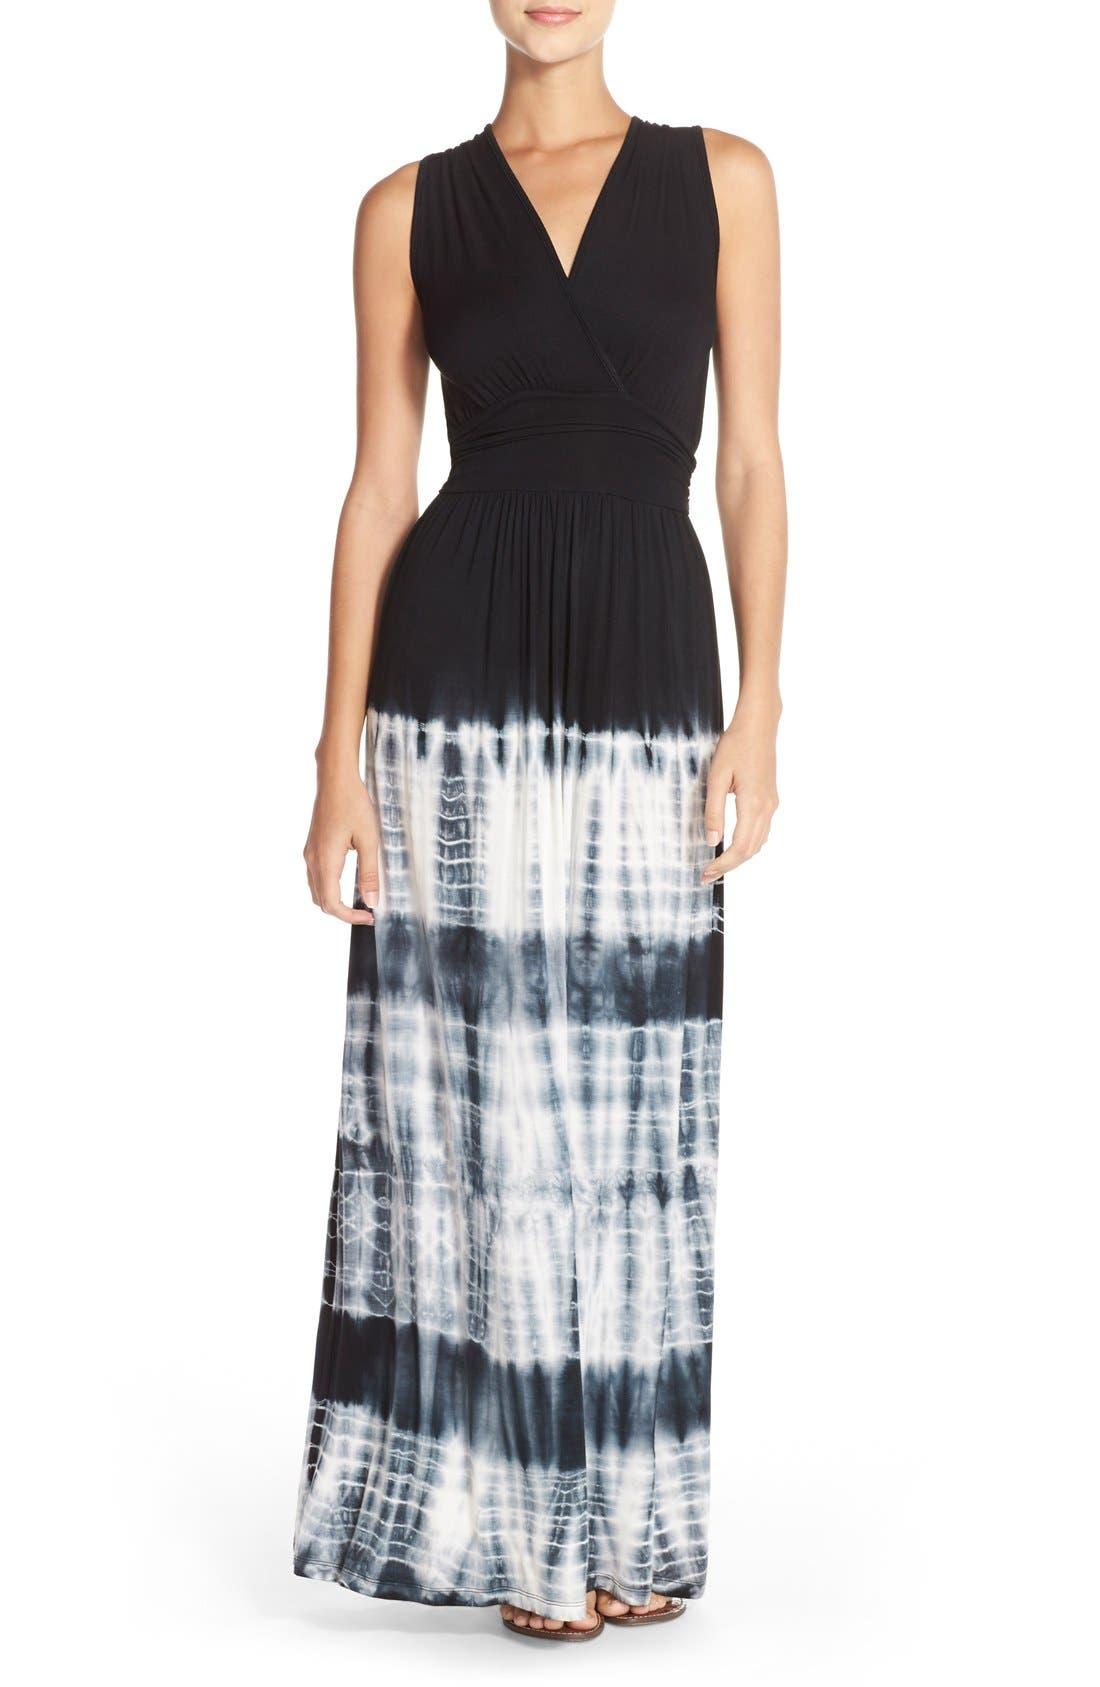 Alternate Image 1 Selected - Fraiche by J Tie Dye Ombré Jersey Maxi Dress